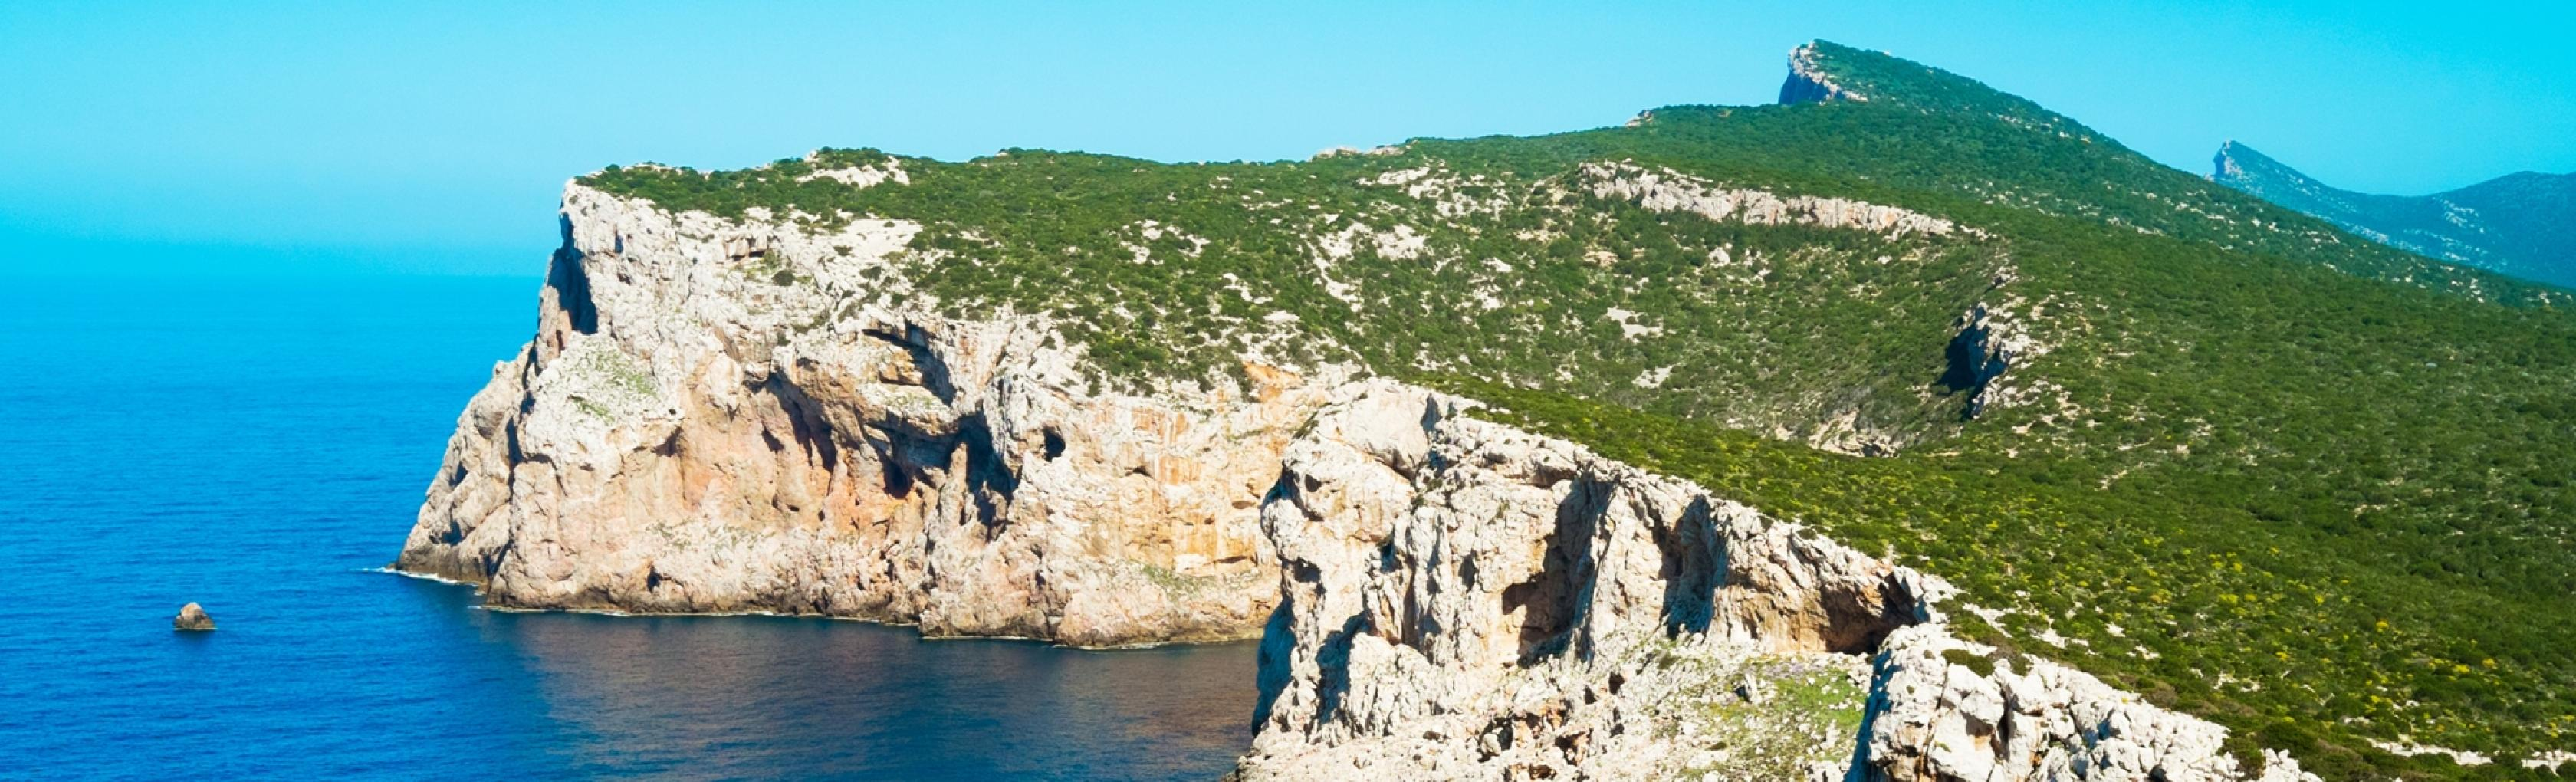 alghero_capo_caccia_elisa_locci_per_itinerari